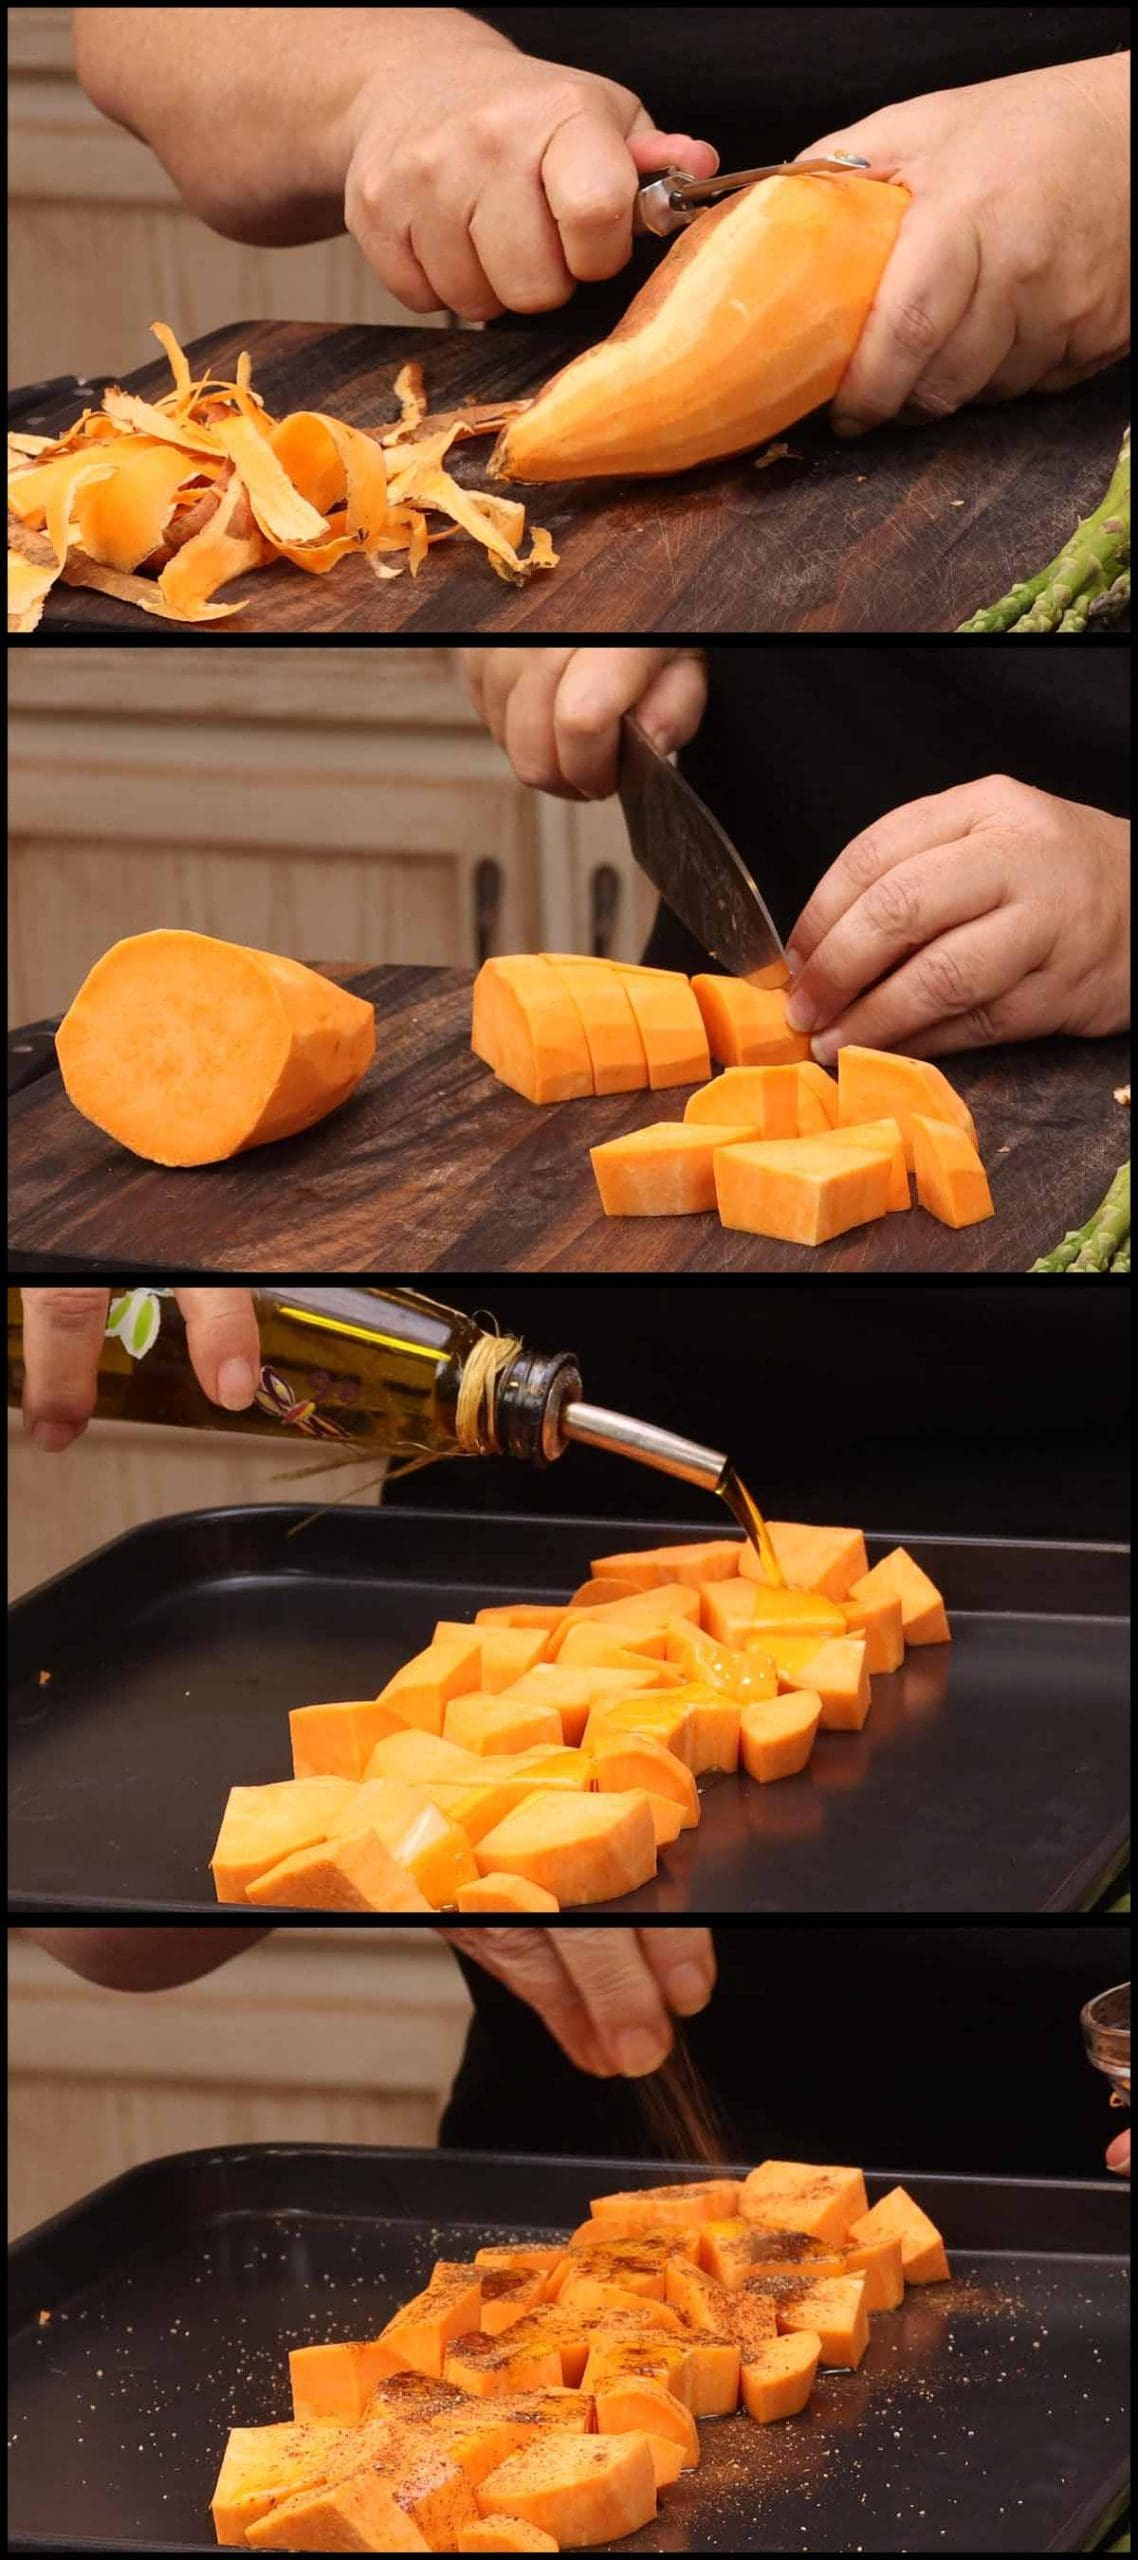 cutting and seasoning sweet potatoes